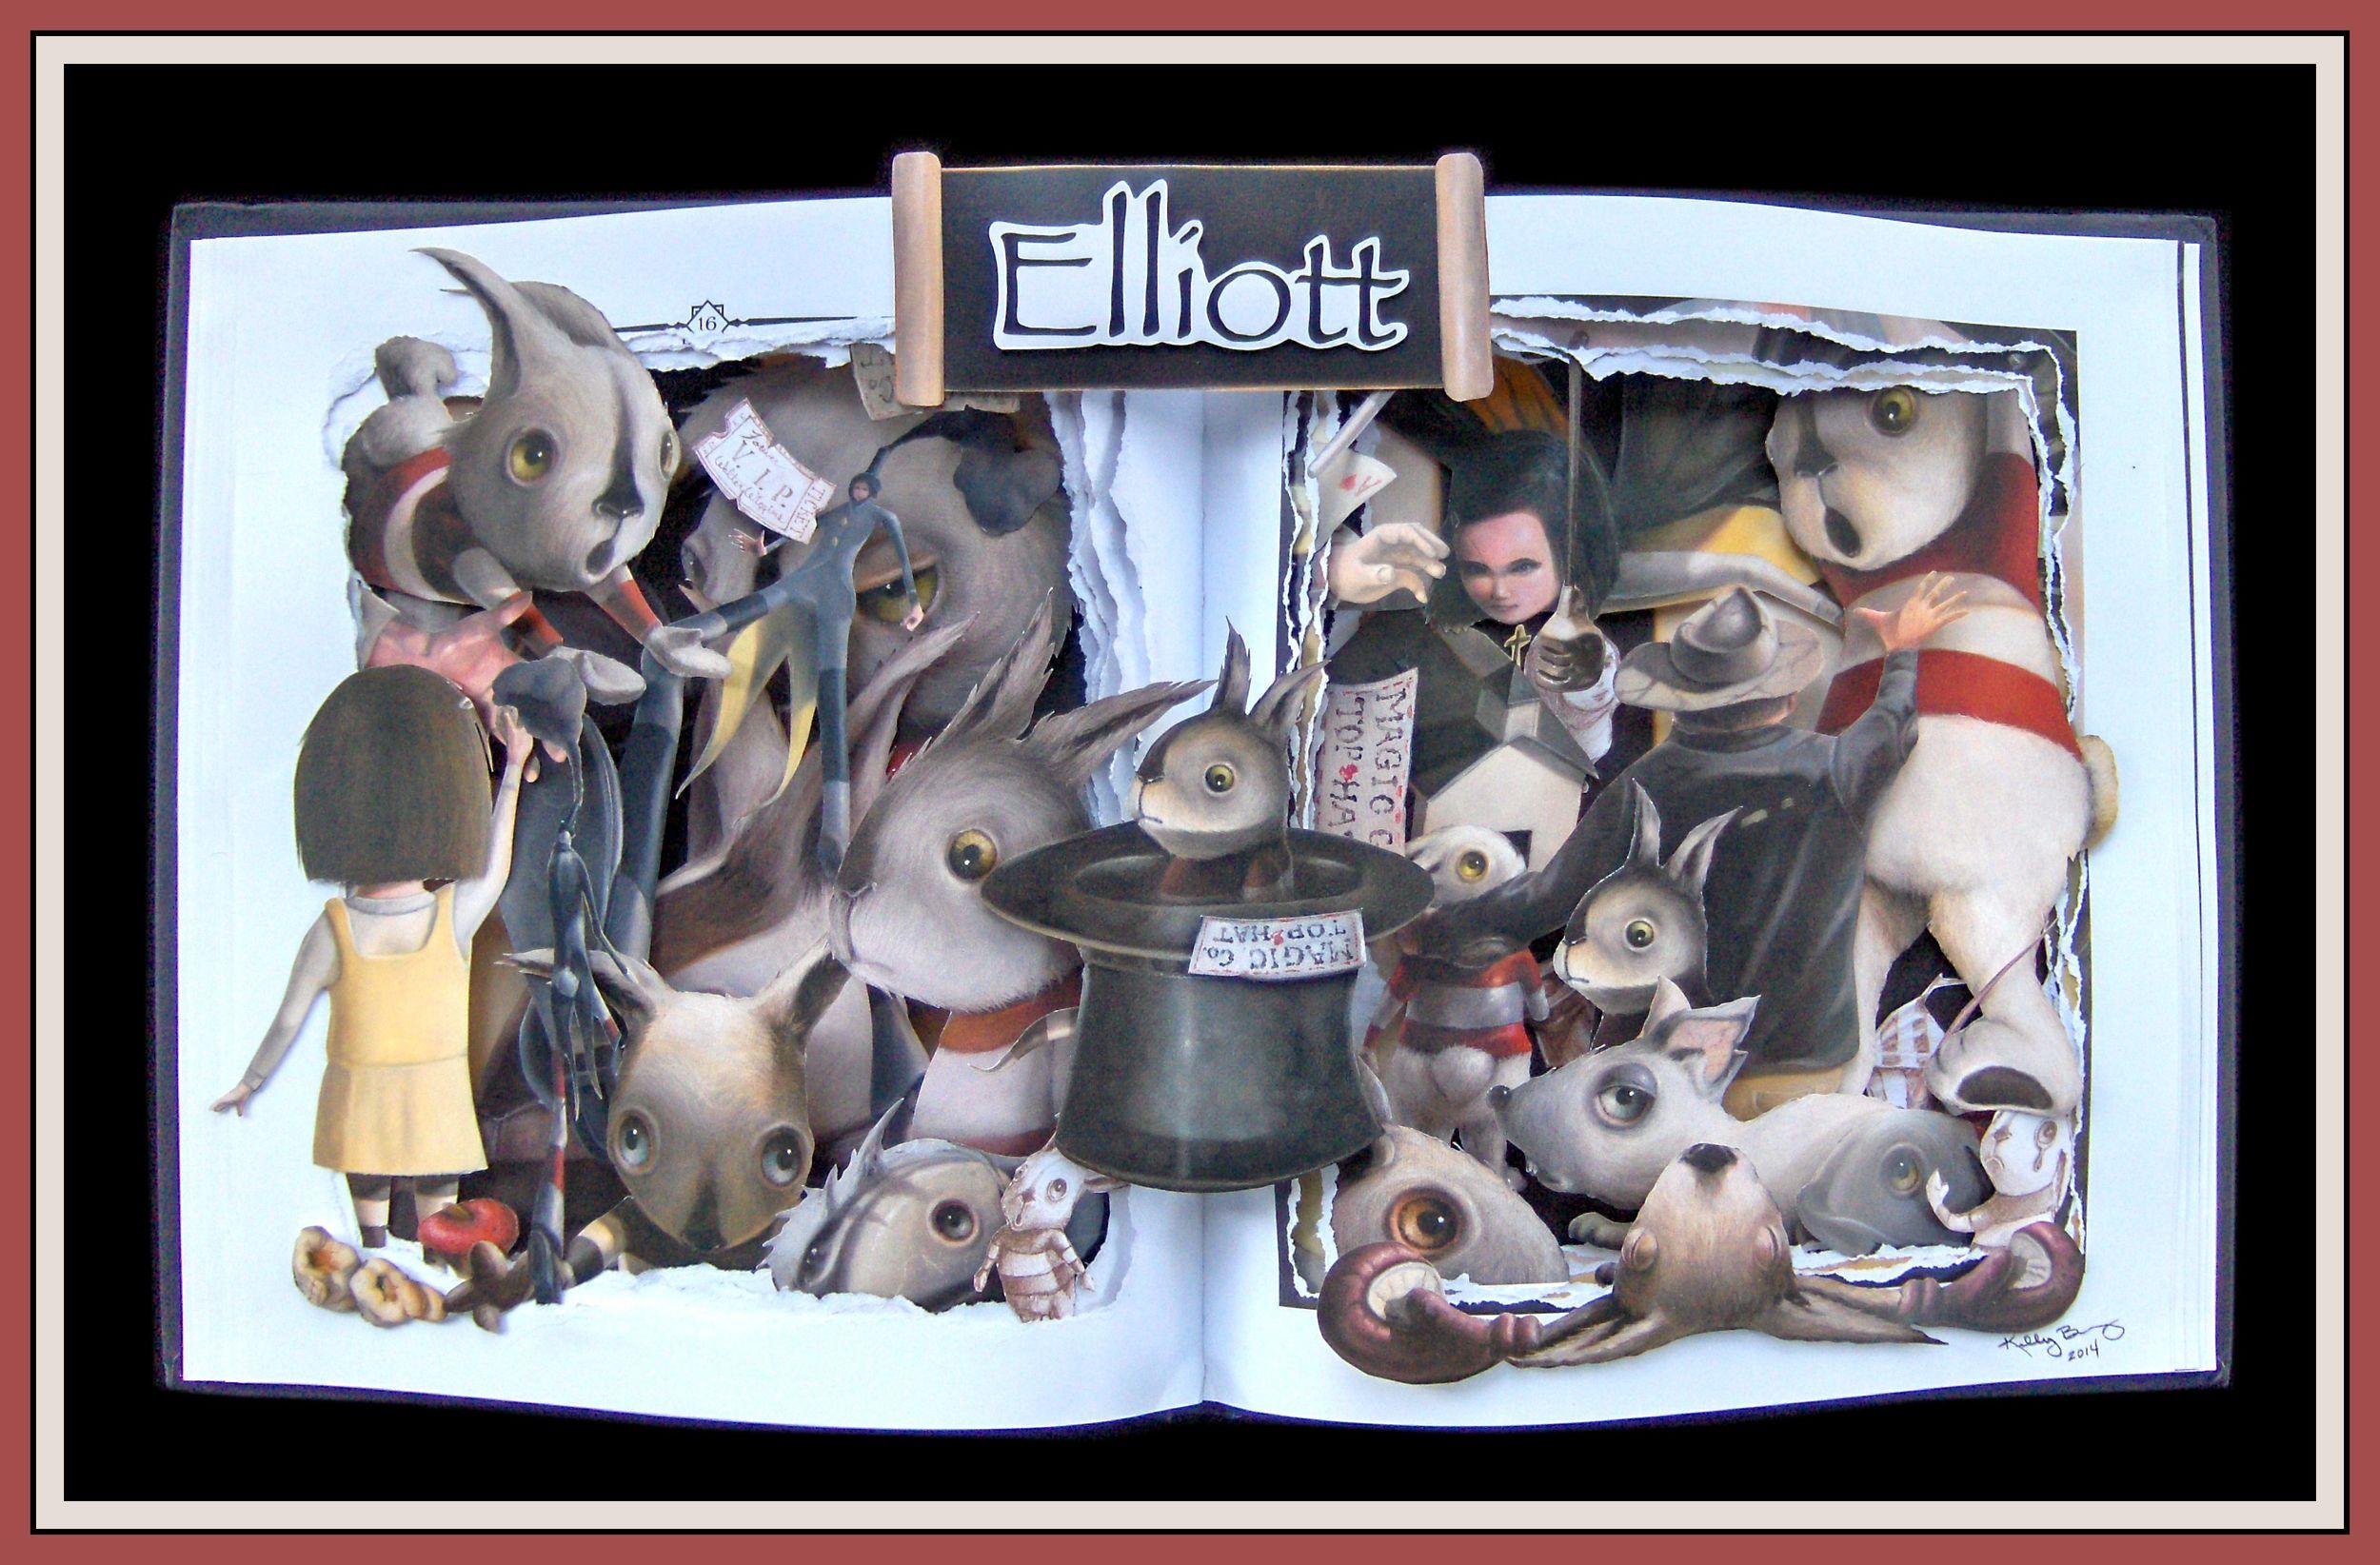 Elliot - 16x20x3 Book Sculpture